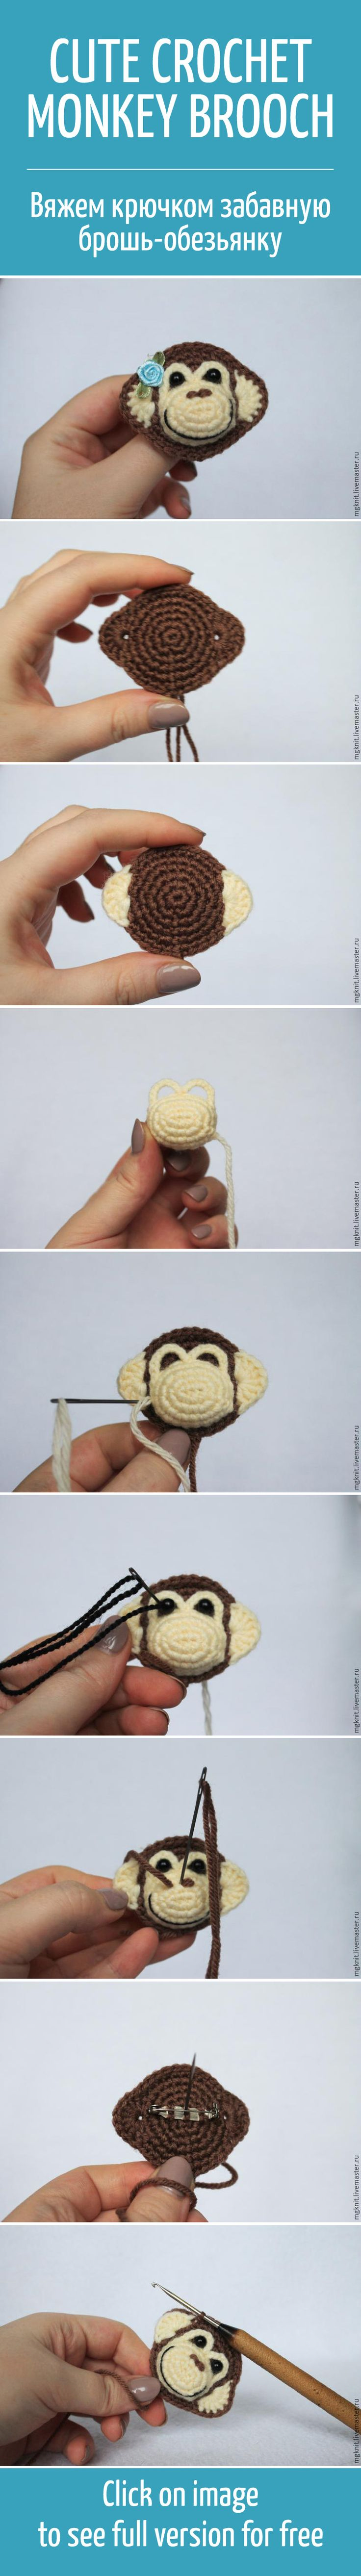 Вяжем крючком забавную брошку-обезьянку / Cute crochet monkey brooch tutorial, DIY